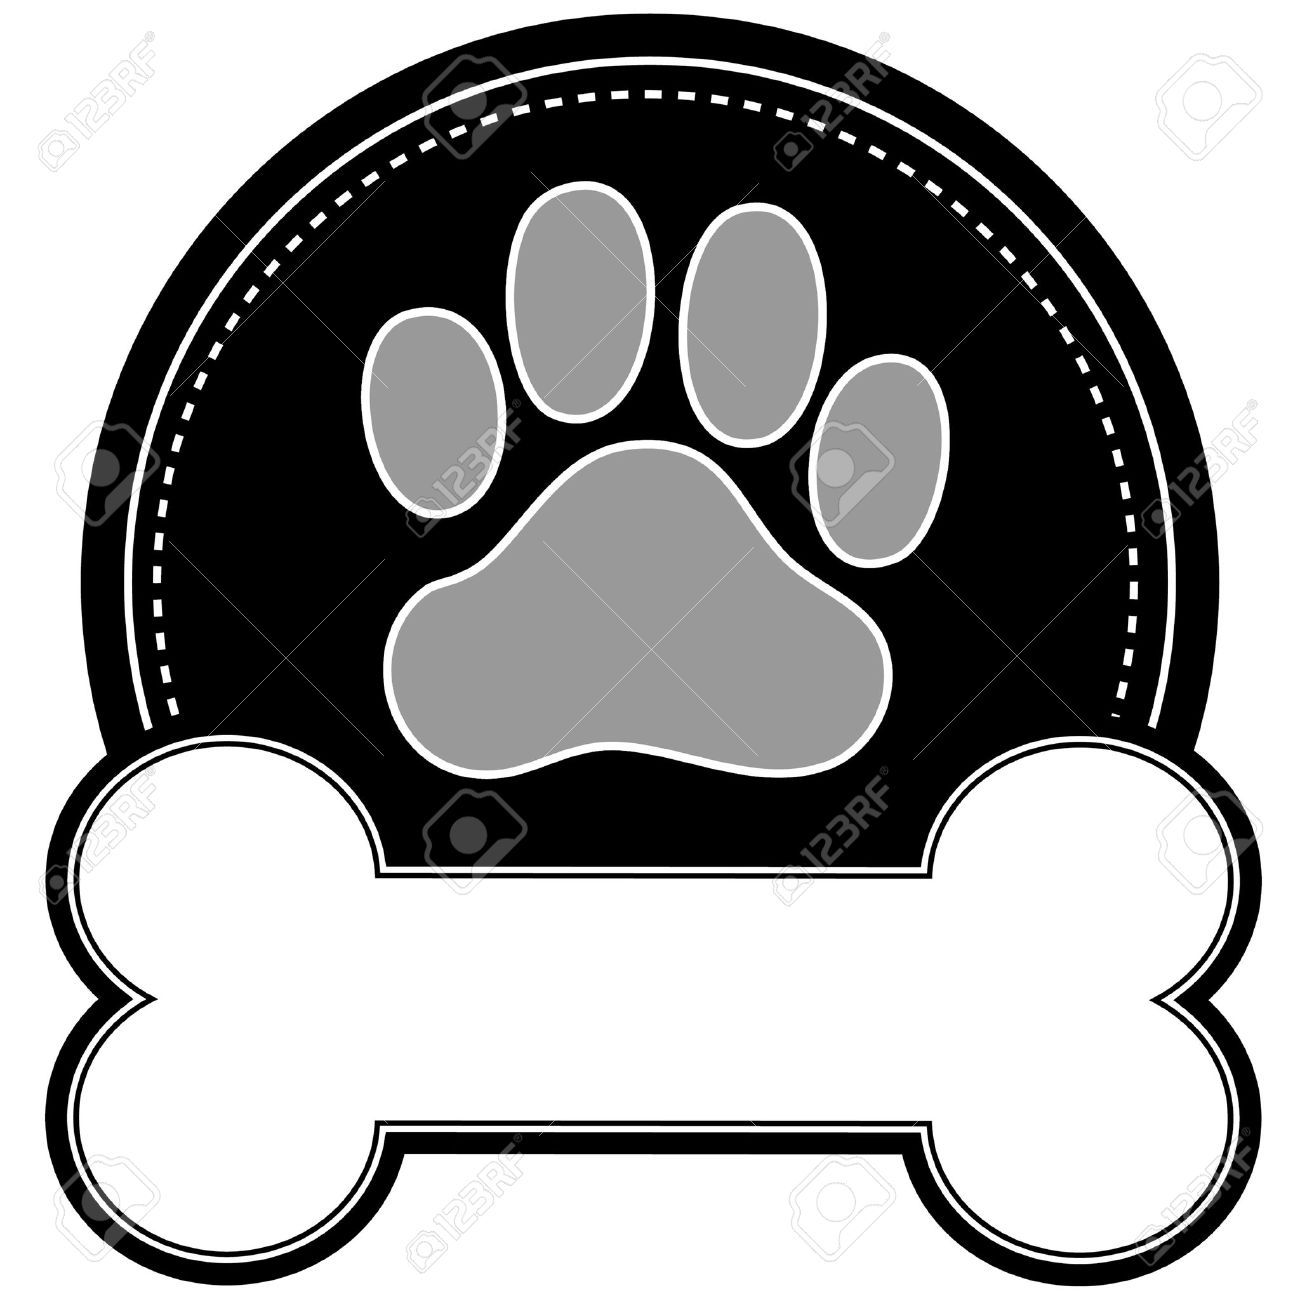 Siluetas De Perros Para Imprimir Buscar Con Google Moldes